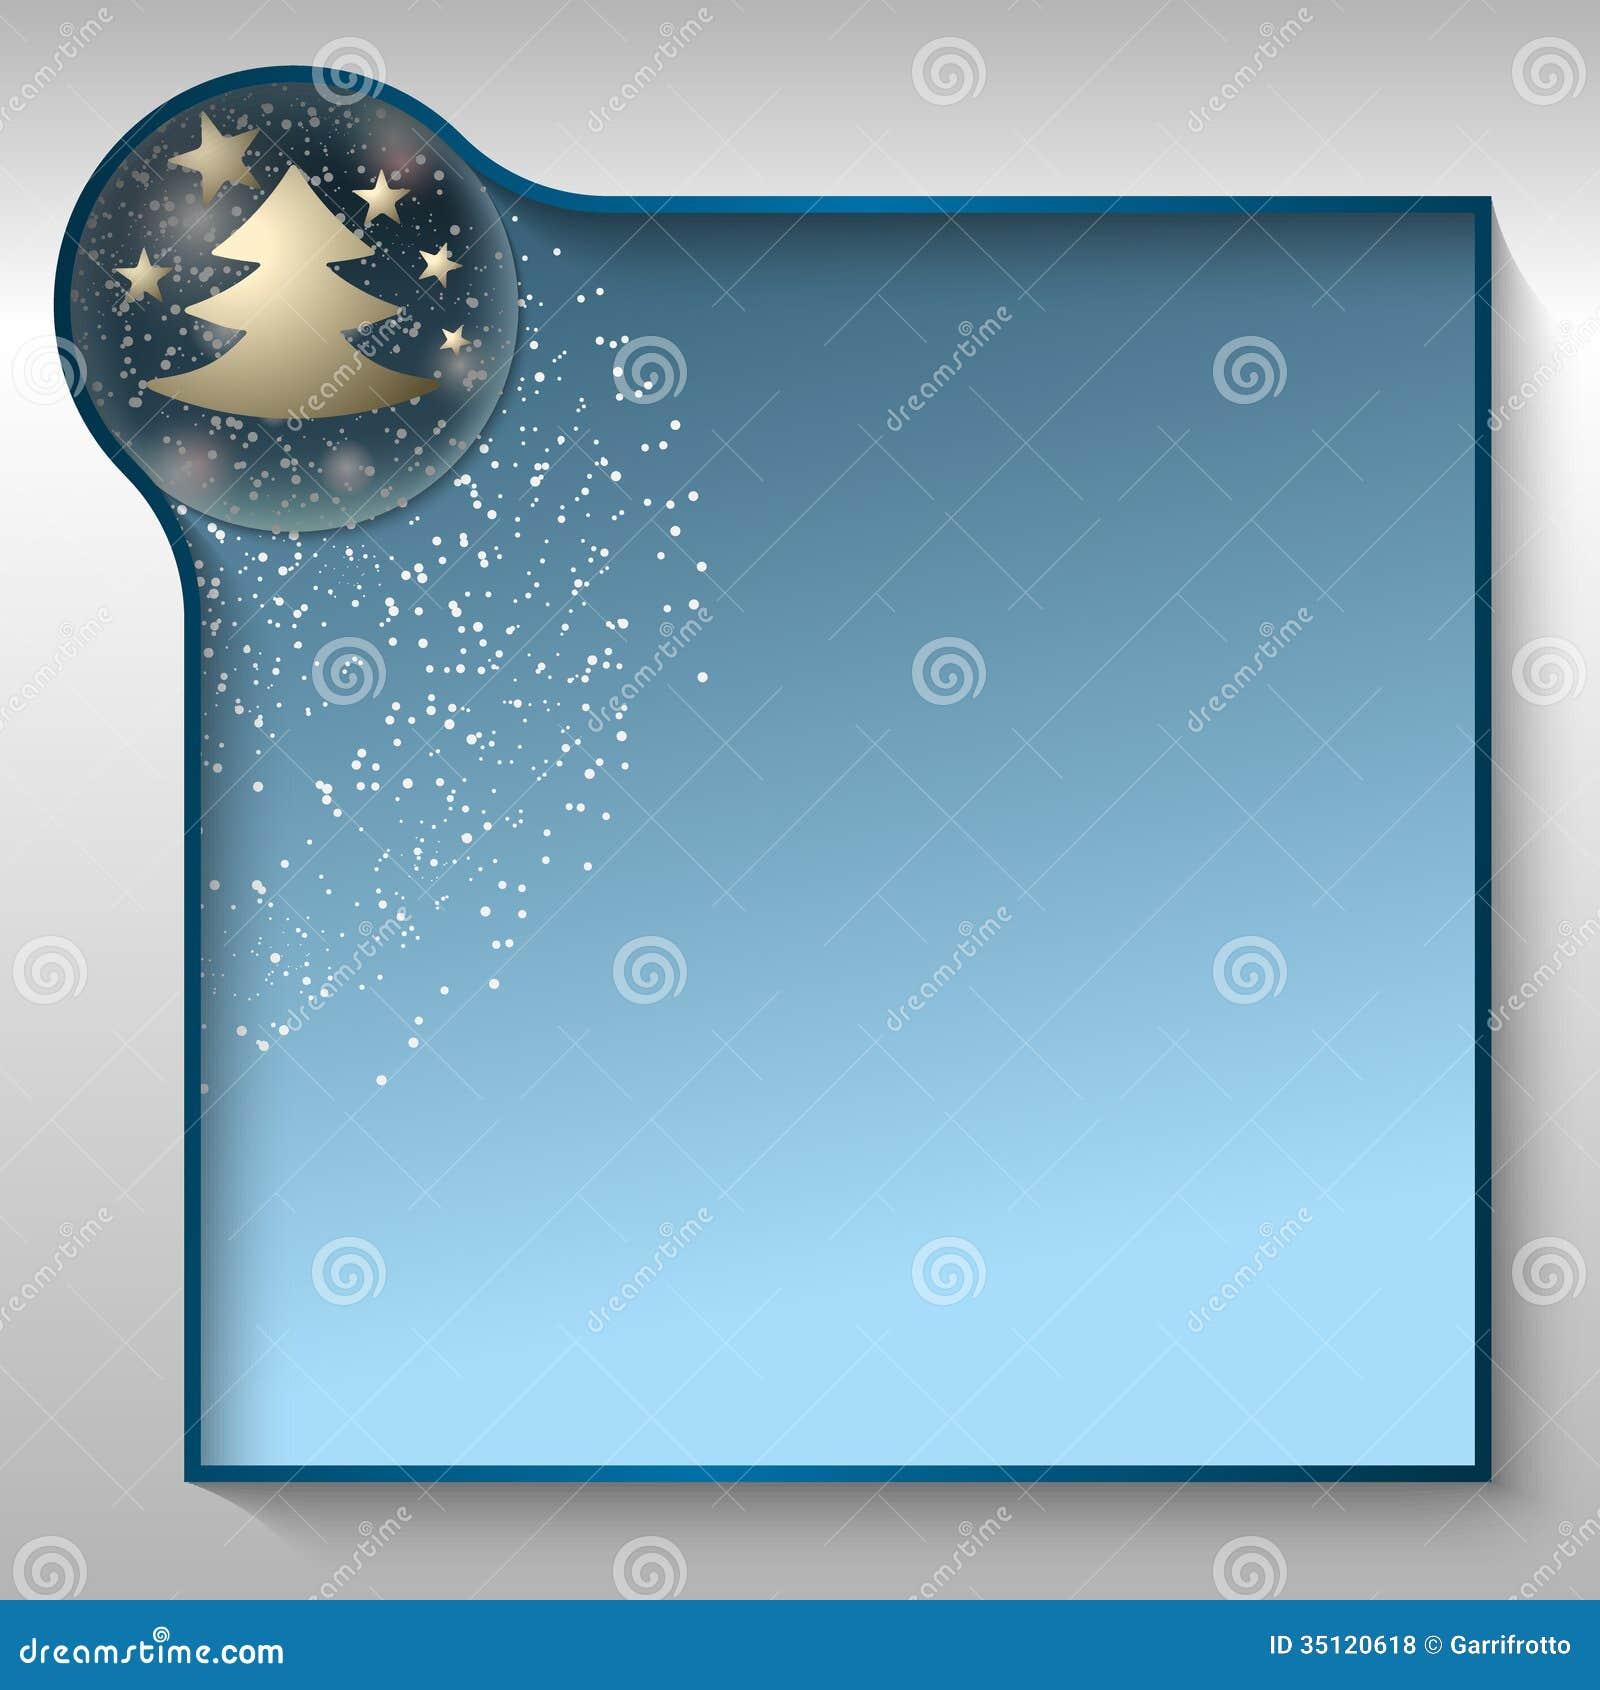 Blue Text Box Royalty Free Stock Photos Image 35120618